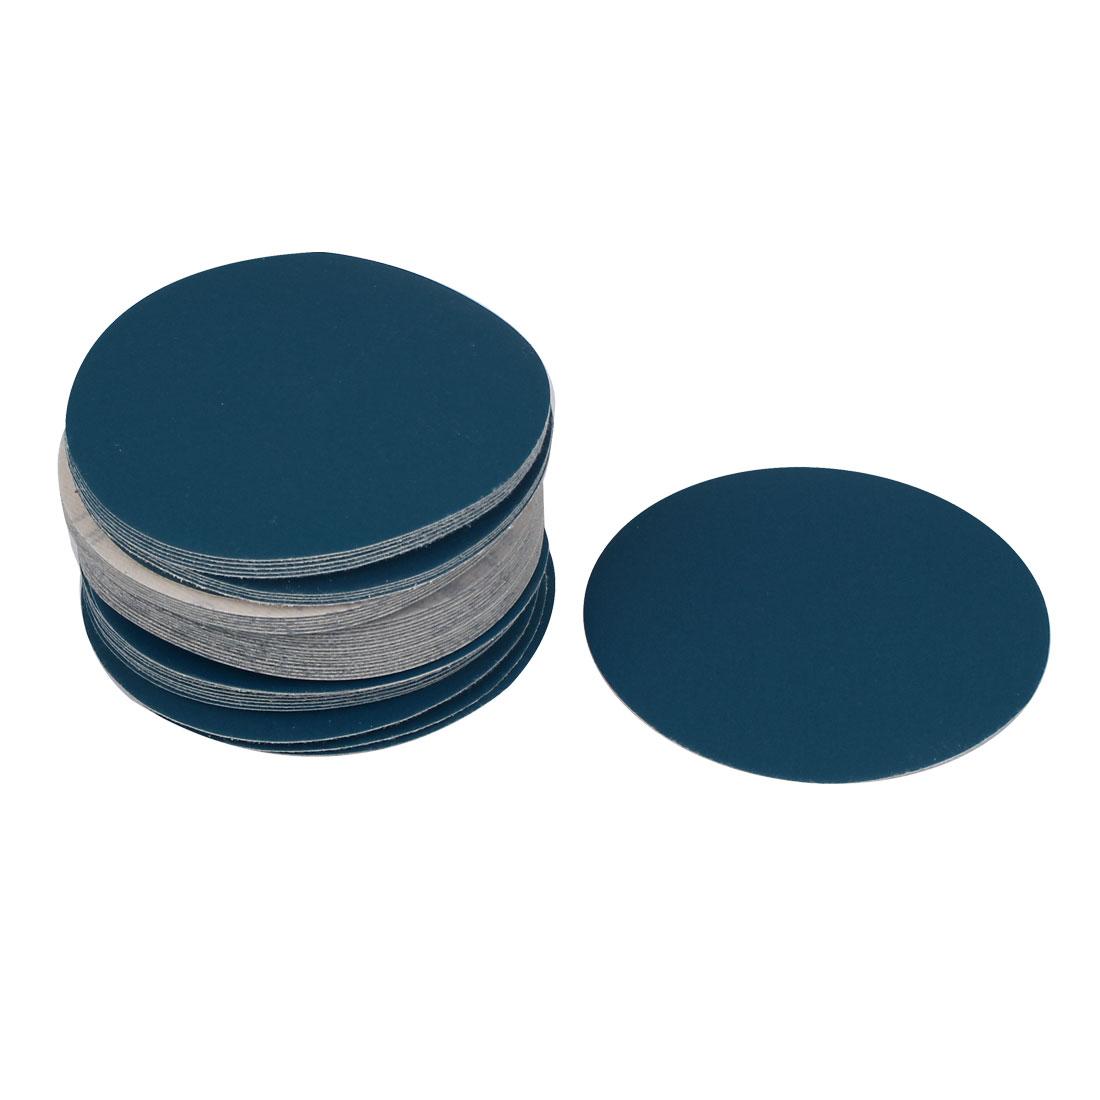 5inch Flocking Sandpaper Auto Car Paint Polishing Sanding Disc 400 Grit 50pcs